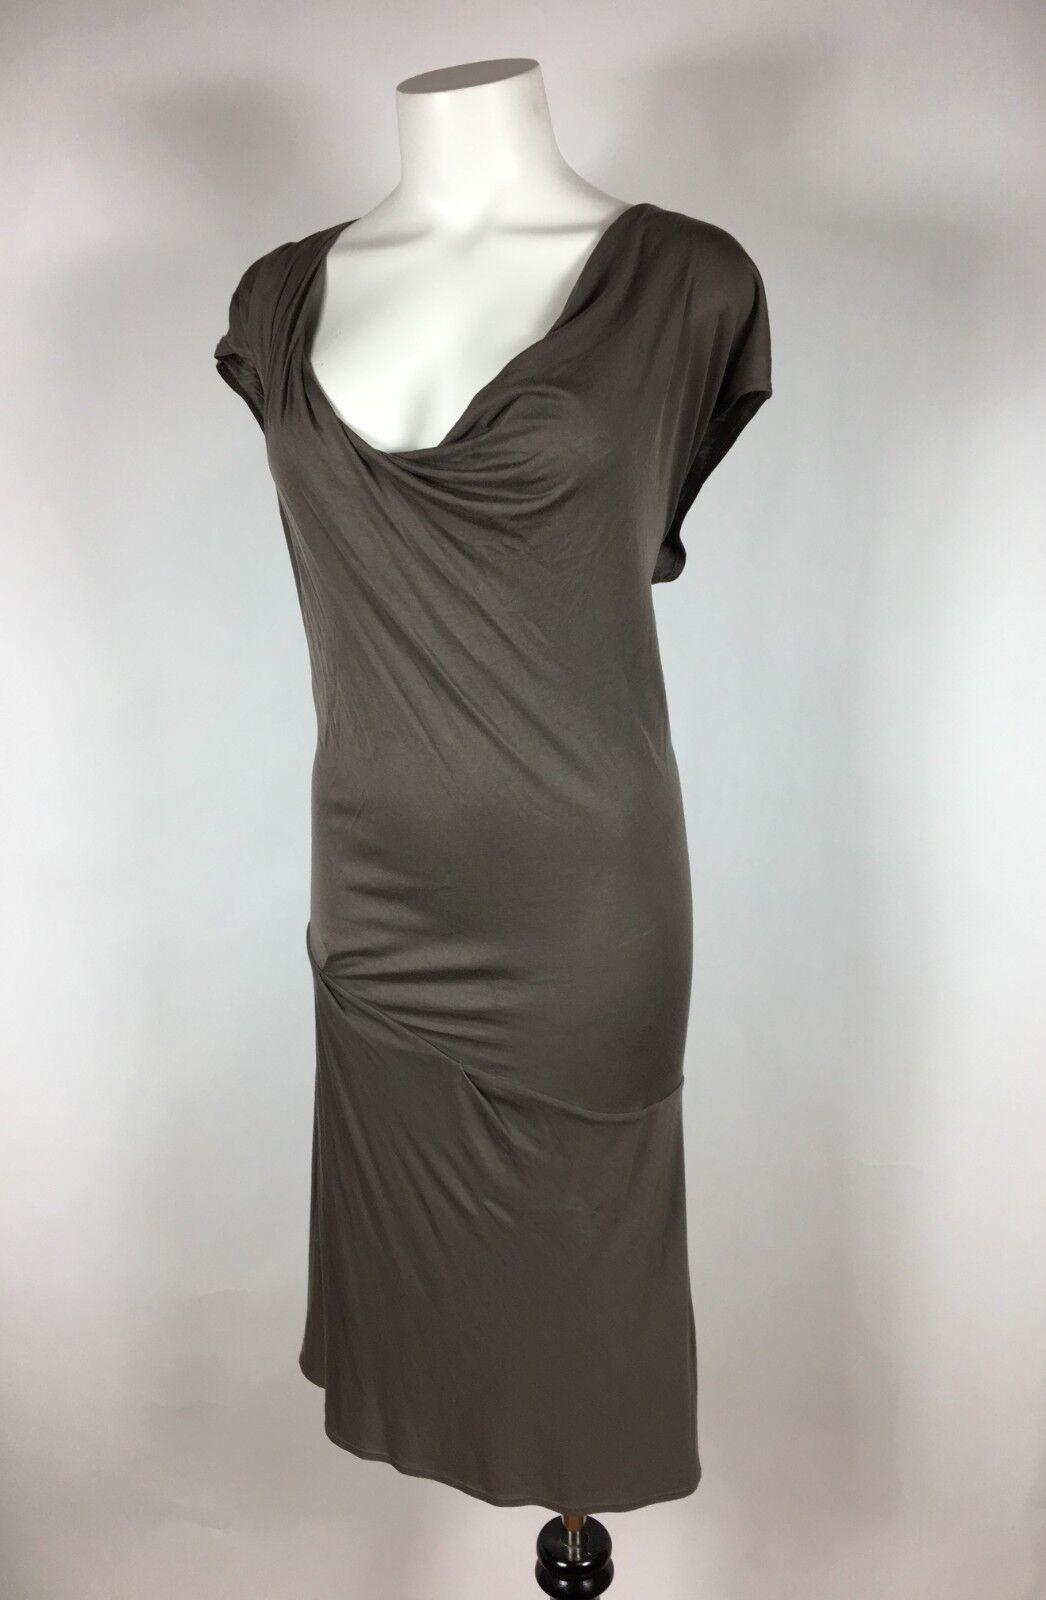 HELMUT LANG Draped Brown Taupe Knee-Length Sheath Dress S